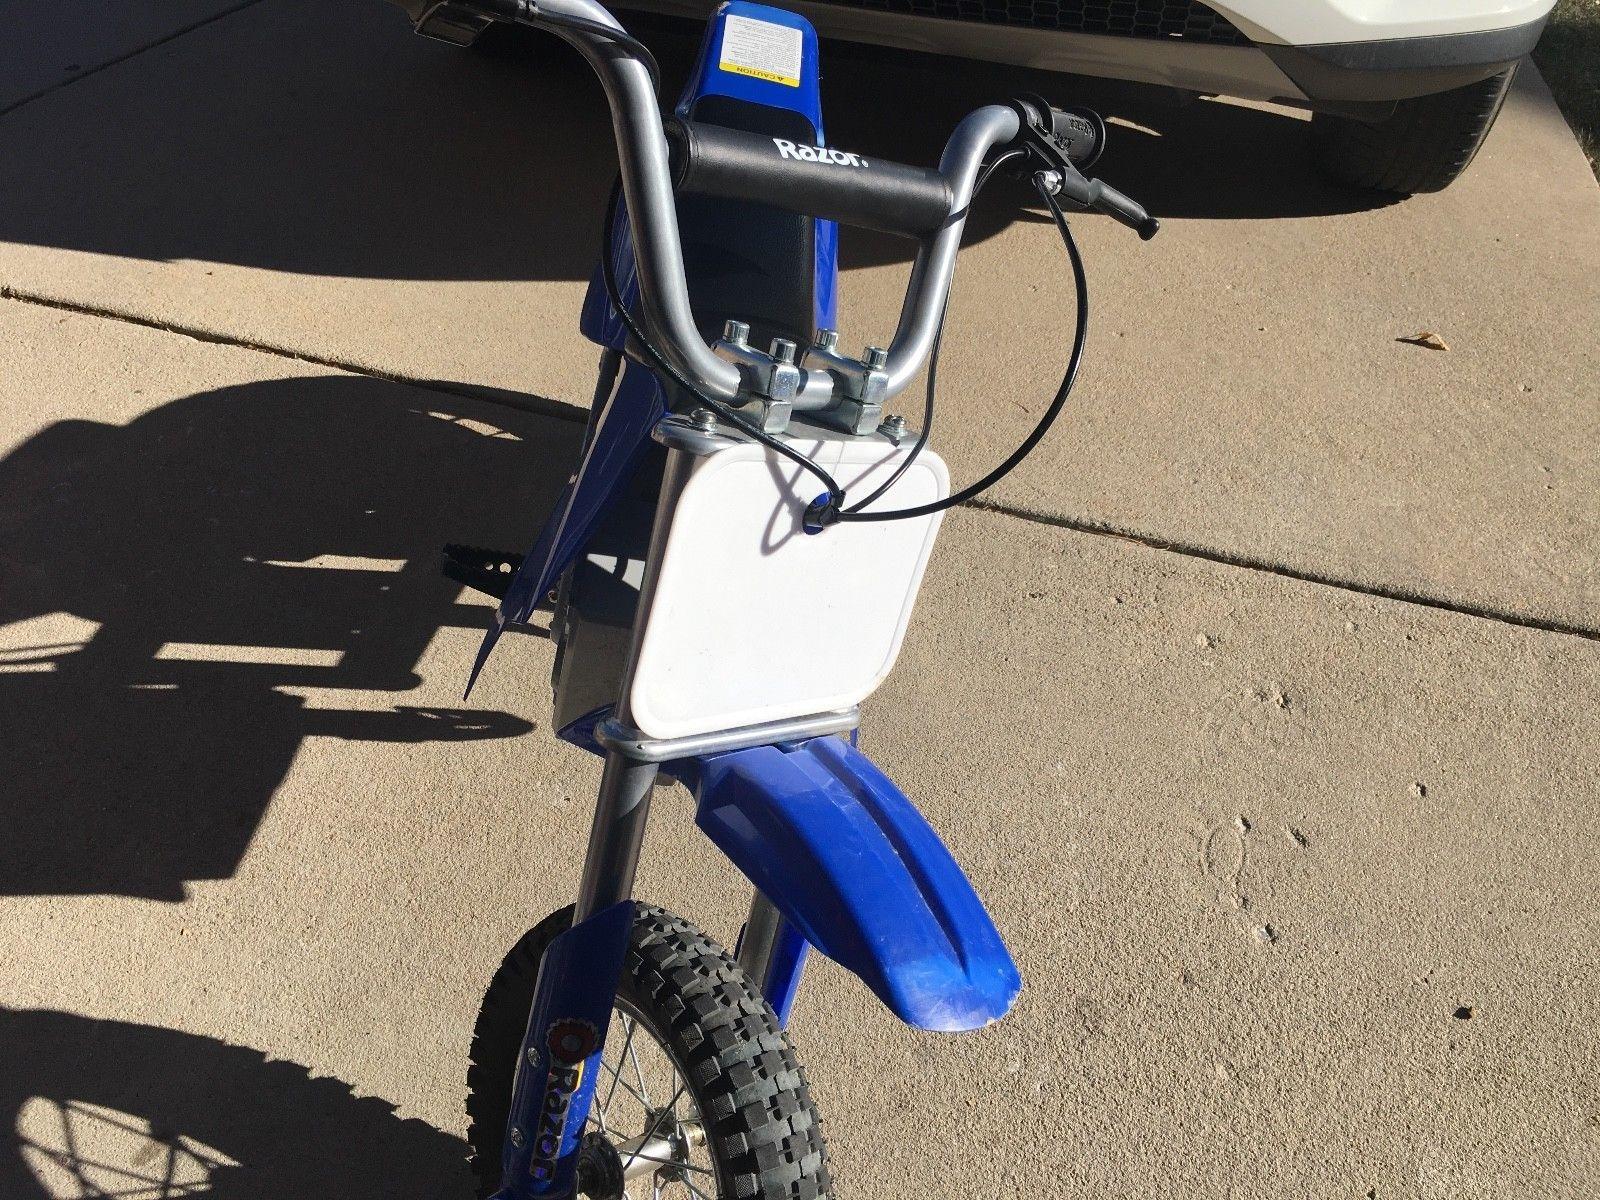 Razor Electric Dirt Bike Motorcycle Zr350 Blue Slightly Used Electric Dirt Bike Dirt Bike Motorcycle